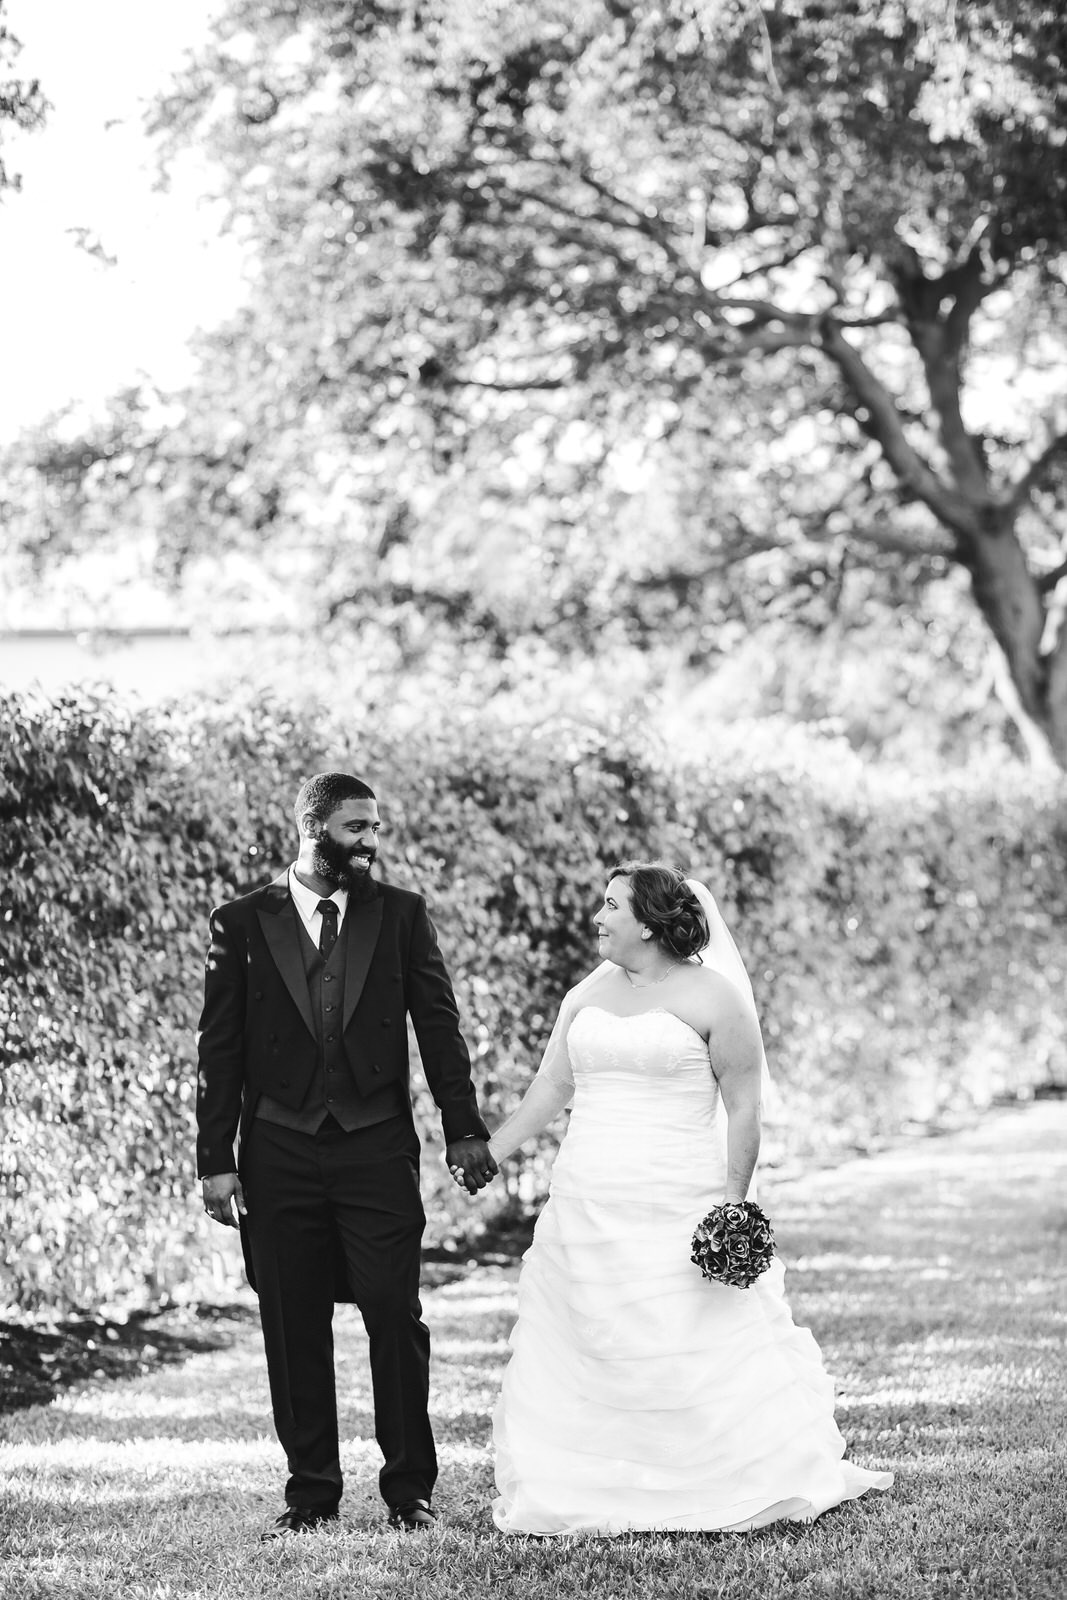 classic-bride-and-groom-portrait-tiny-house-photo-intimate-weddings.jpg